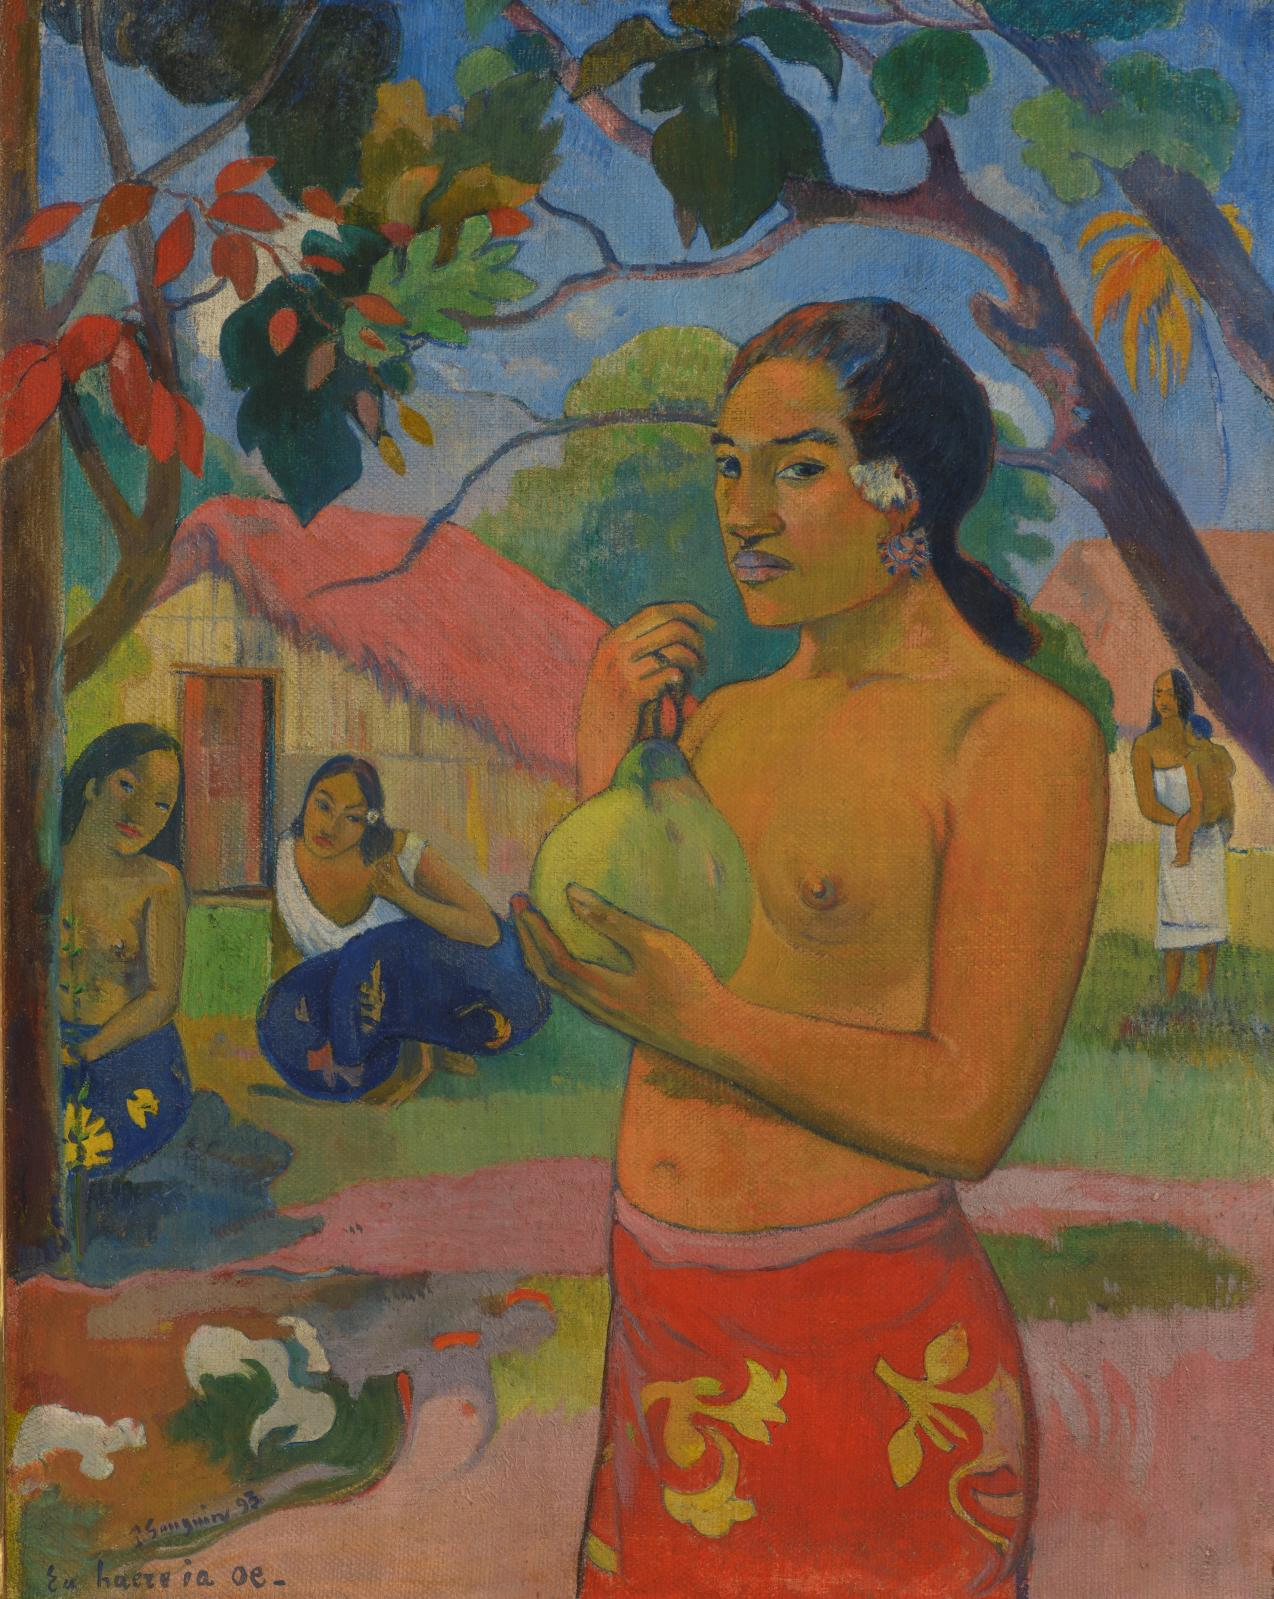 Paul Gauguin (1848-1903), Eu haere ia oe (Où vas-tu?) La Femme au fruit, 1893, huile sur toile, 92,5x73,5cm, musée d'État de l'Ermitag